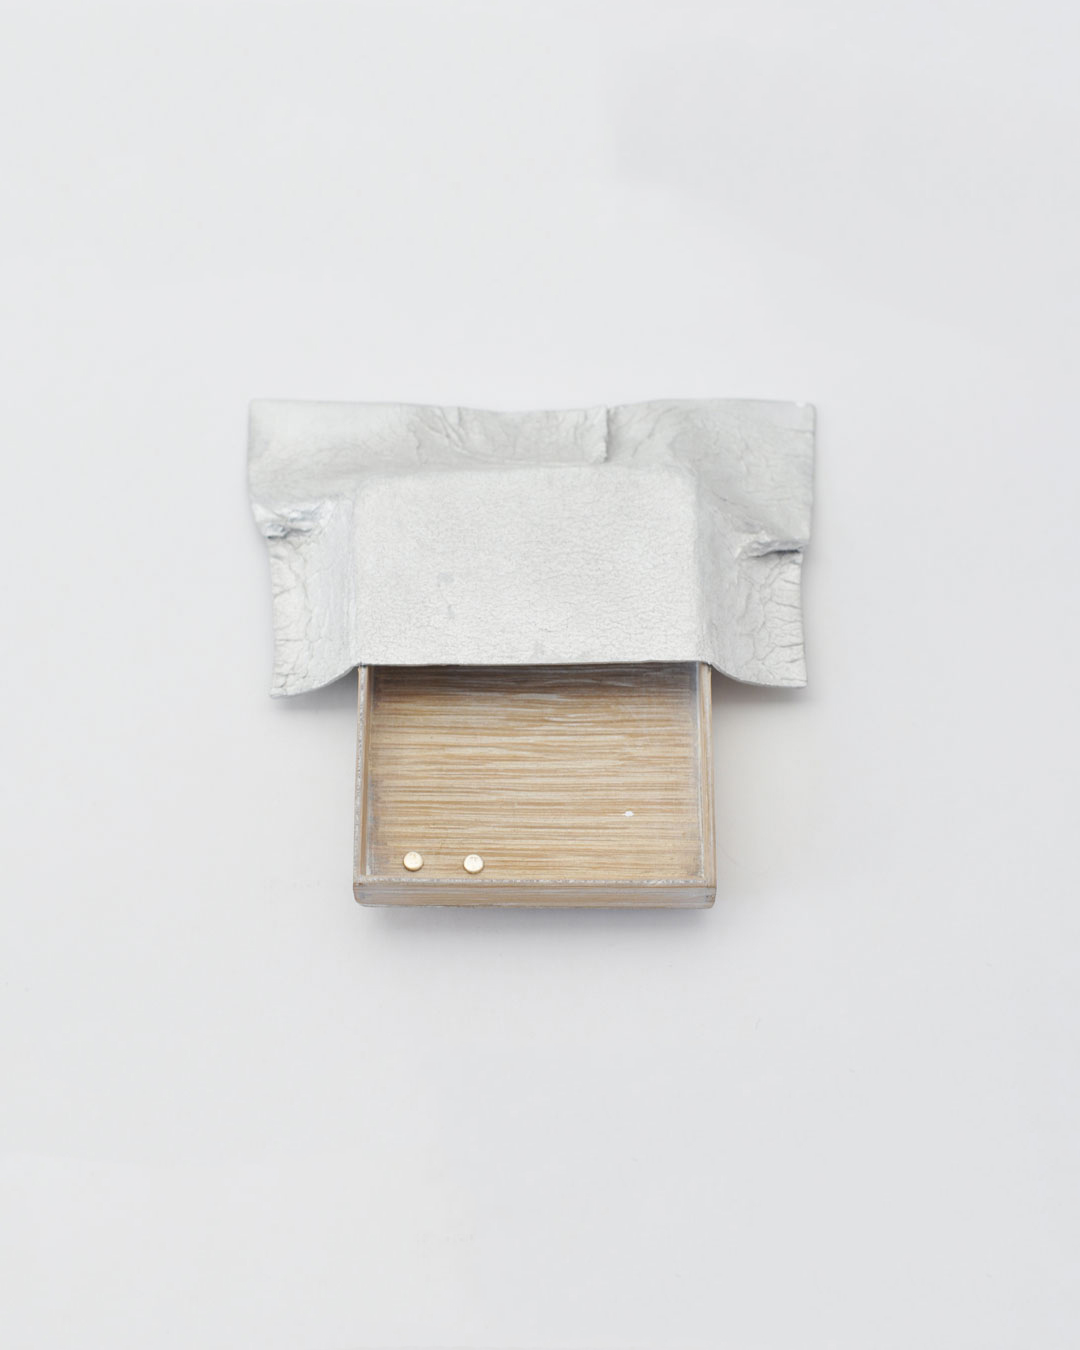 Anders Ljungberg, Declaration #6, 2019, brooch; aluminium, laminated oak, steel, silver, 120 x 125 x 20 mm, €920